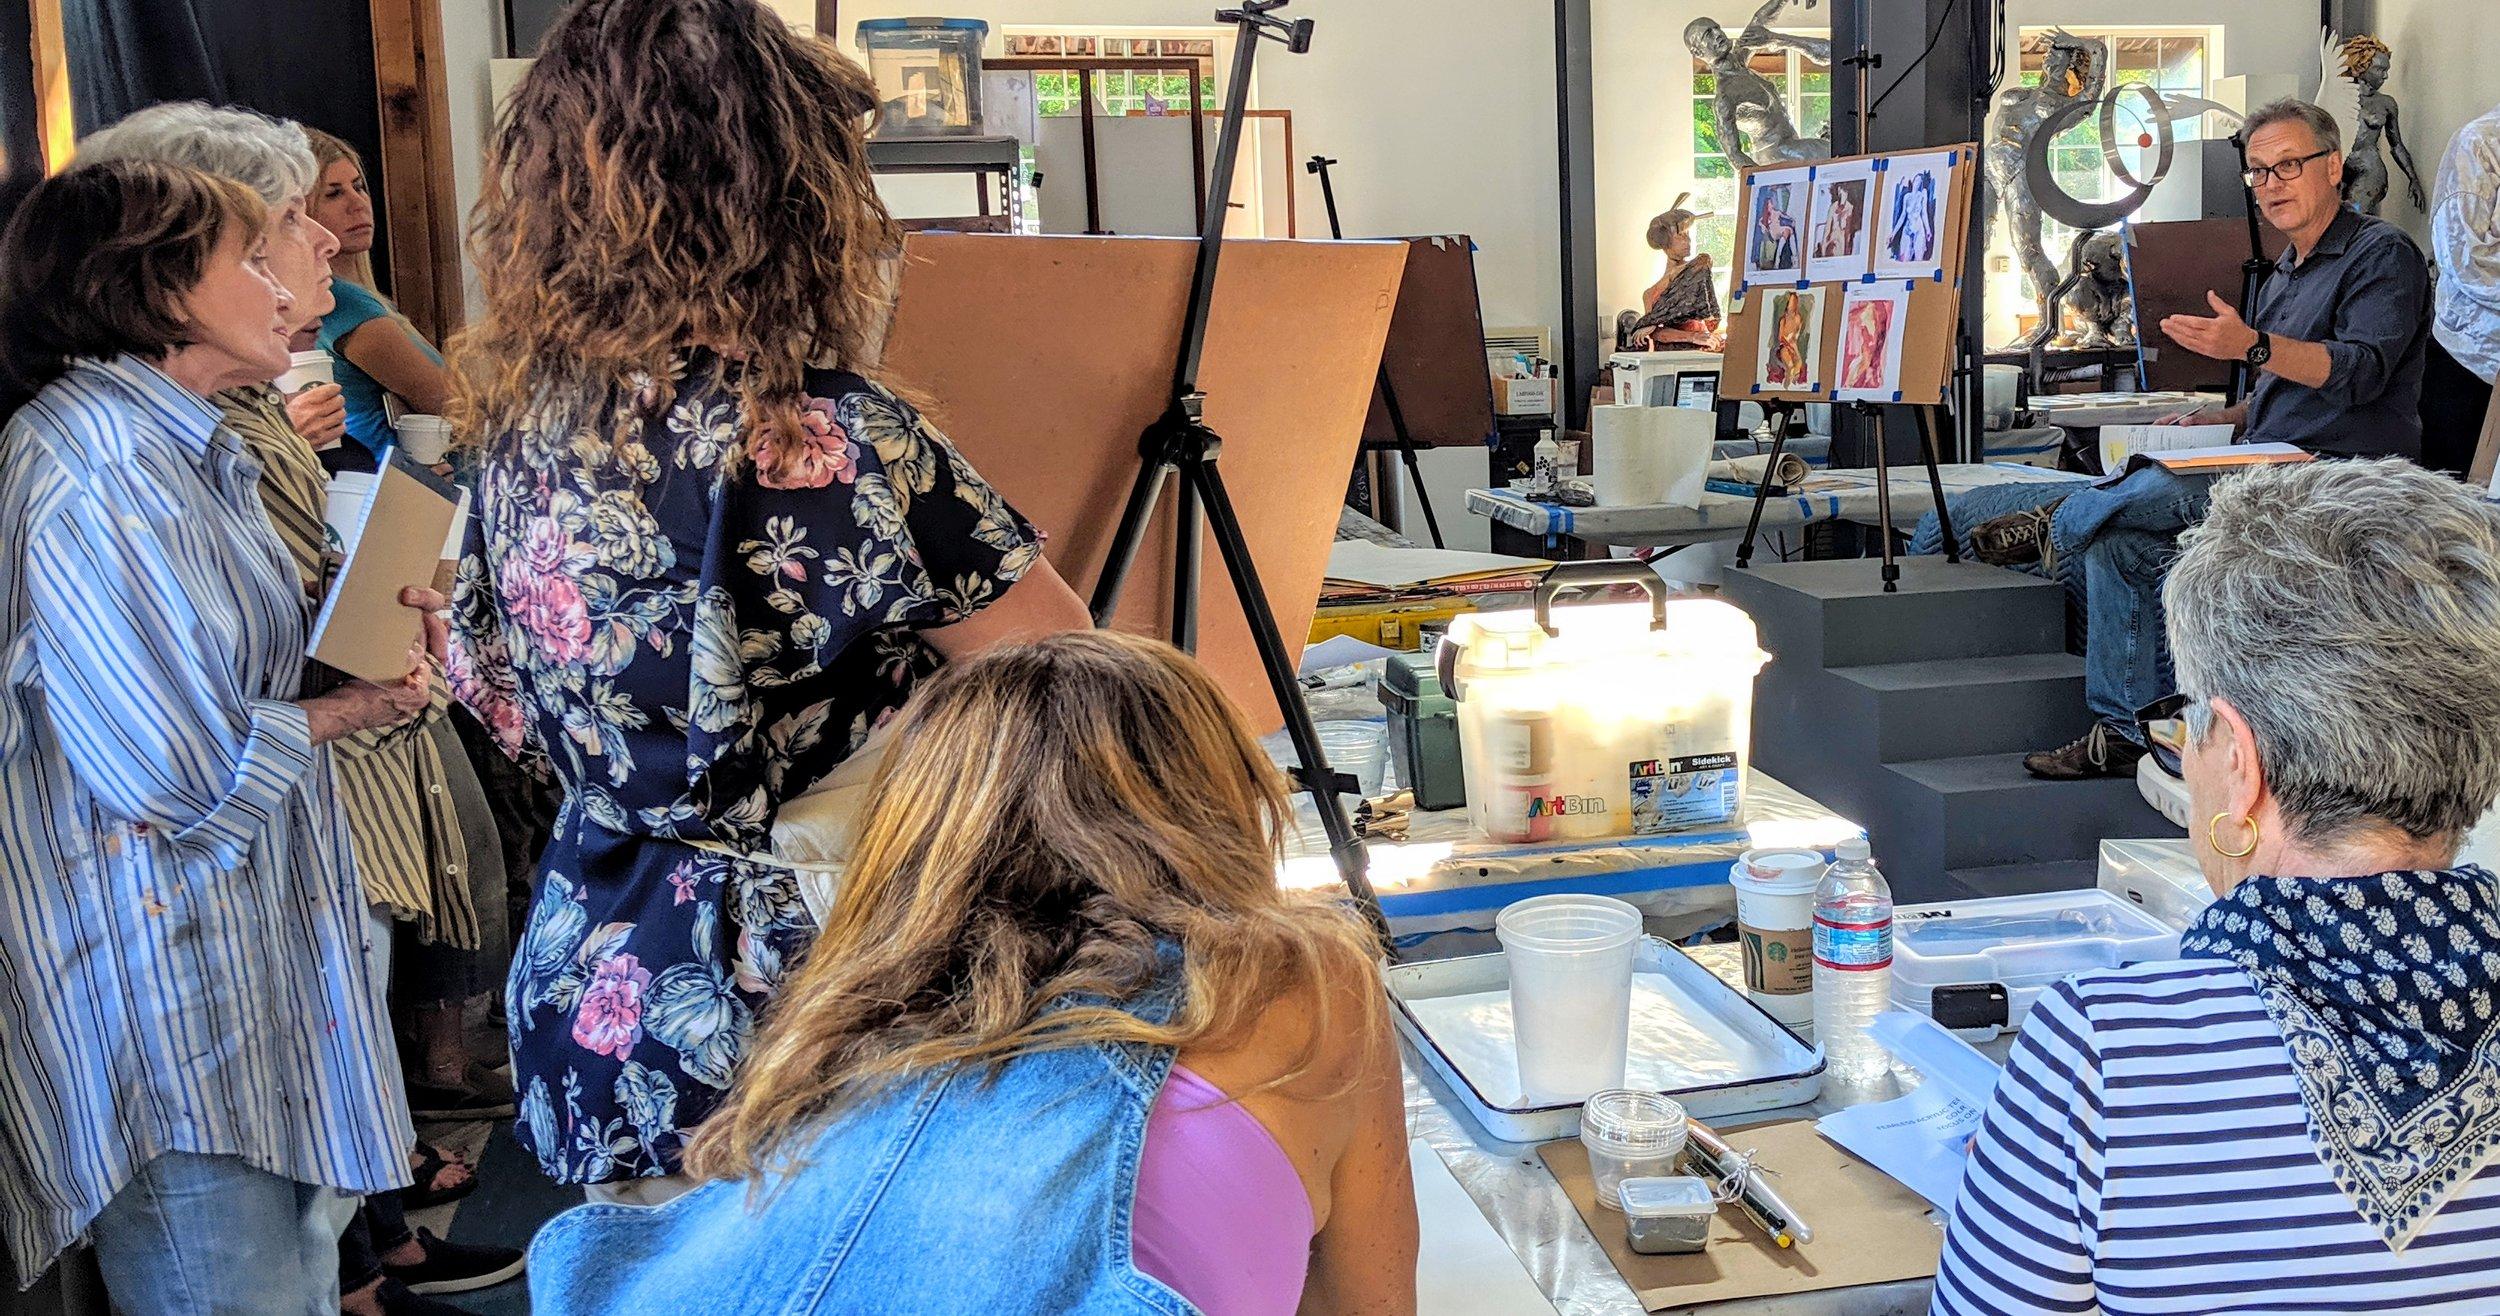 July Art Barn Workshop: Preparing for a Painting Demonstration